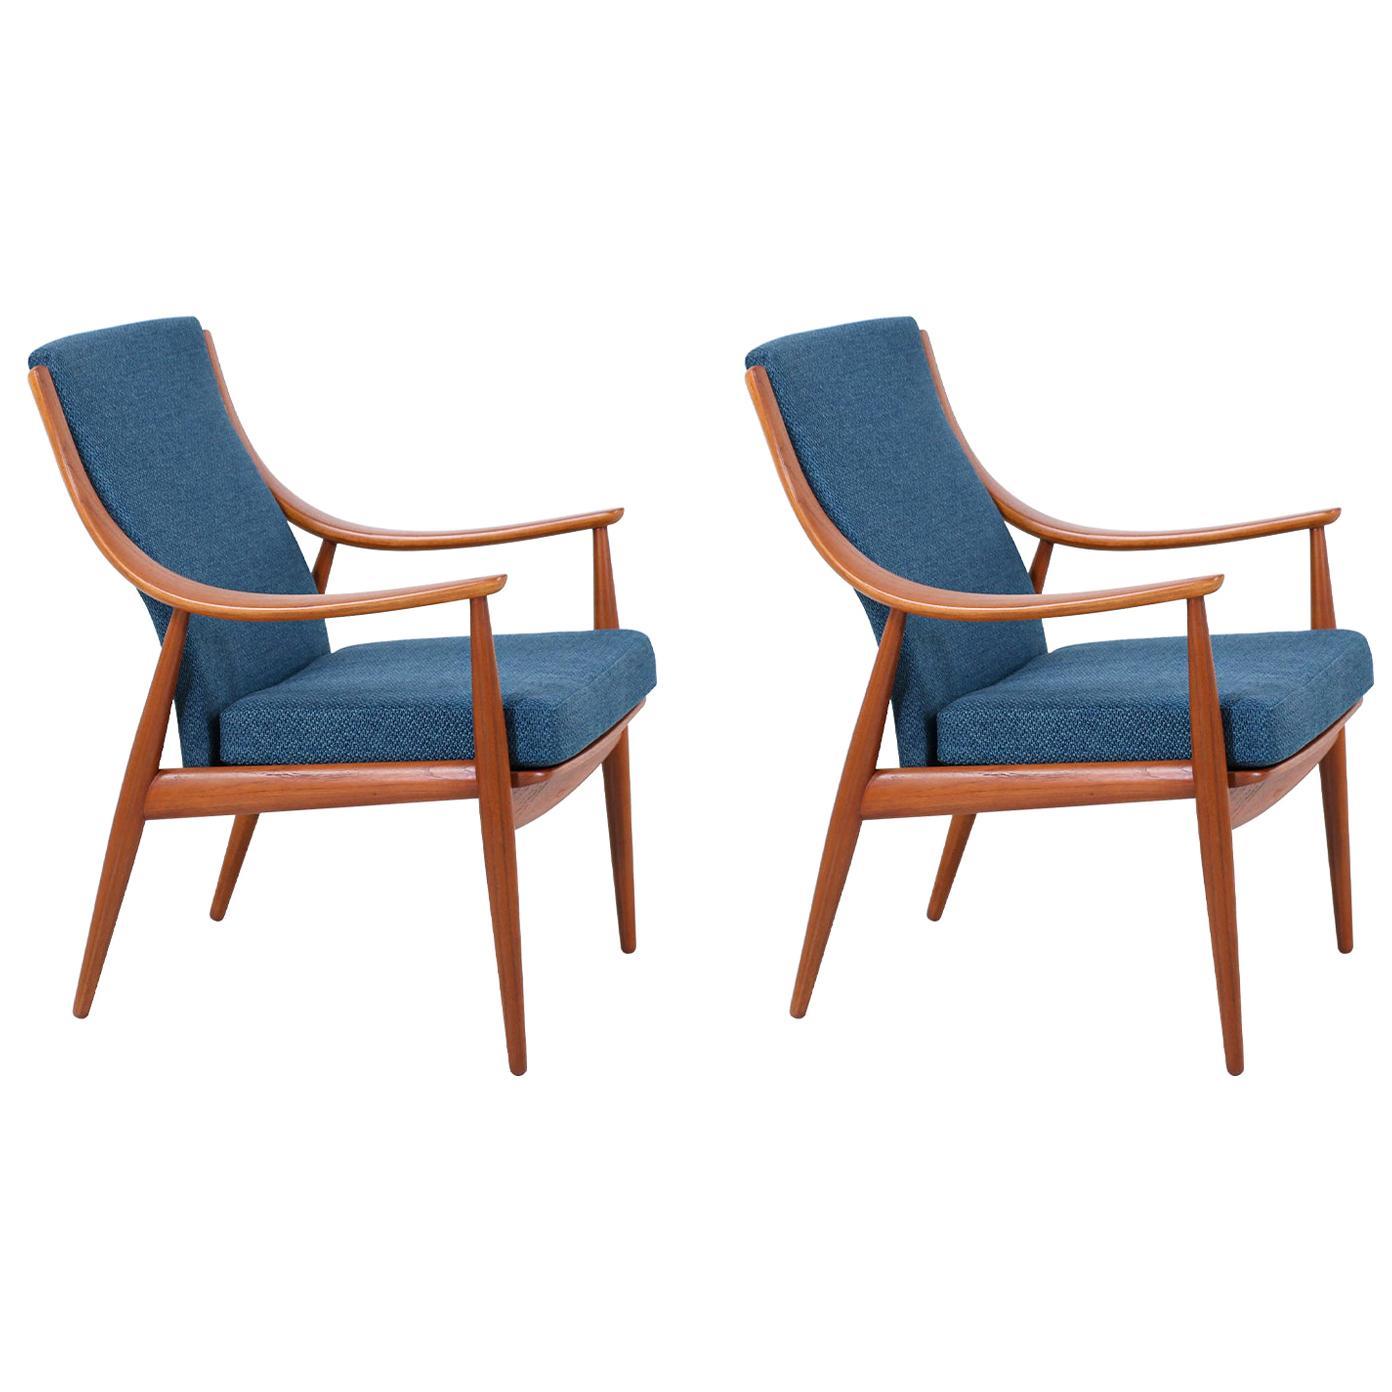 Peter Hvidt & Orla Mølgaard-Nielsen Teak Lounge Chairs for France & Søn